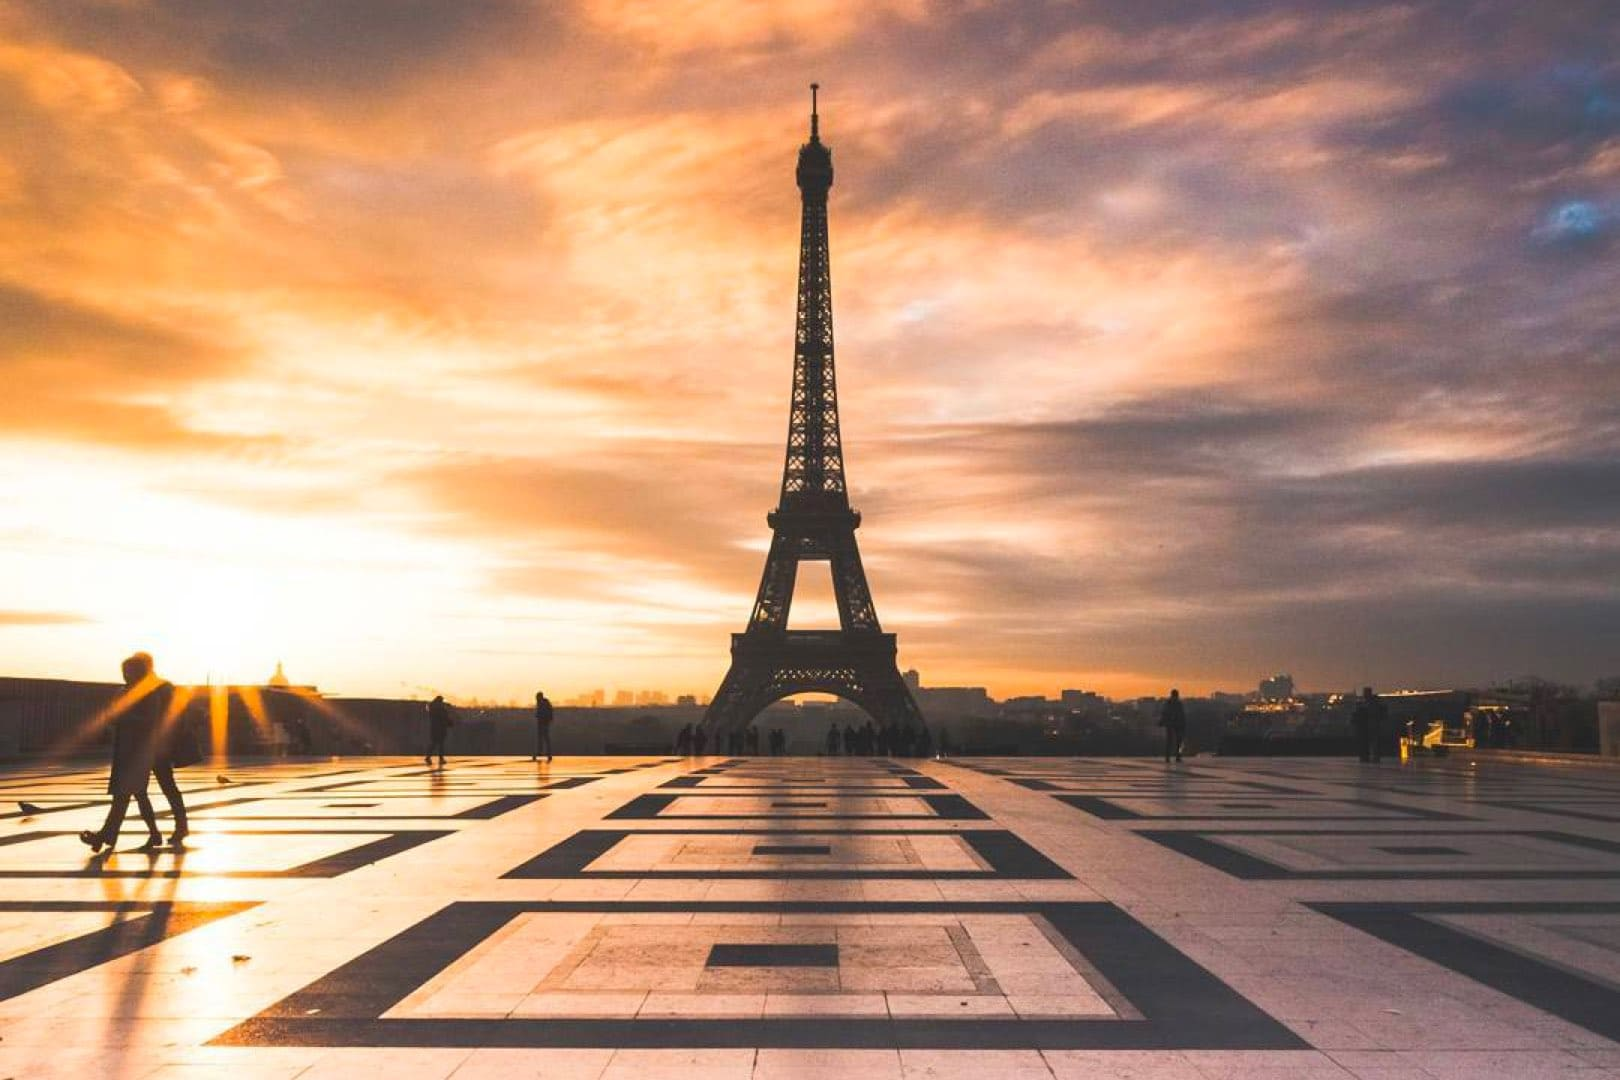 Things To Do Near The Eiffel Tower Parisbym